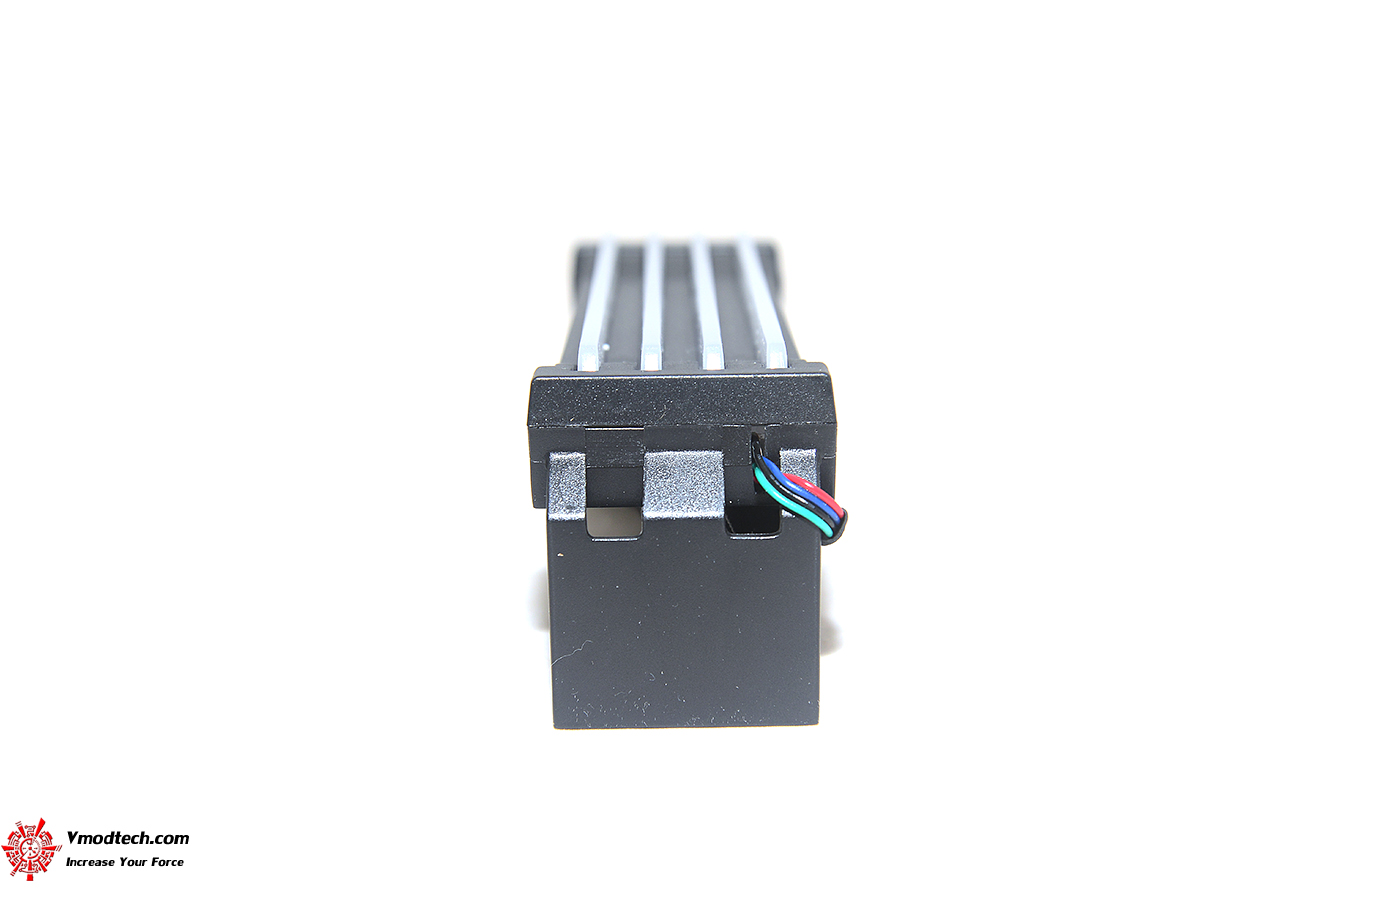 dsc 5486 Thermaltake Pacific R1 Plus DDR4 Memory Lighting Kit Review